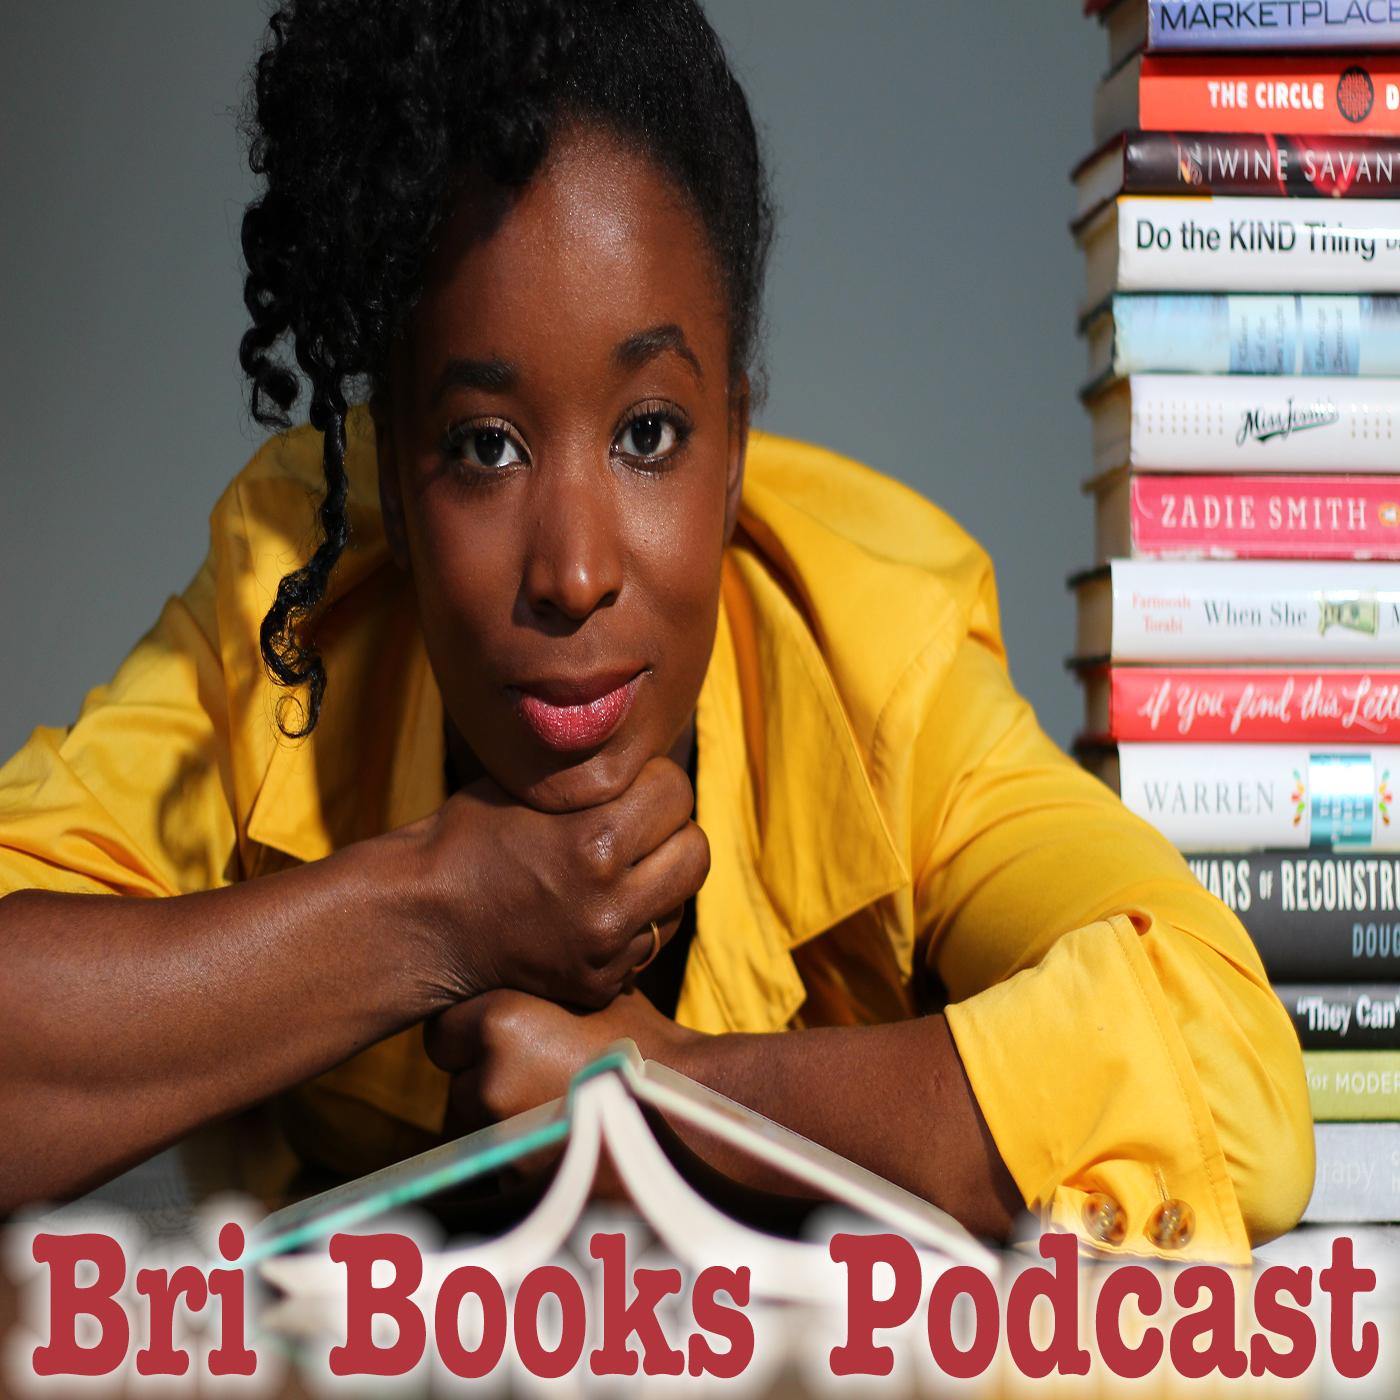 Bri Books Feat. @PodcastsInColor Founder Berry